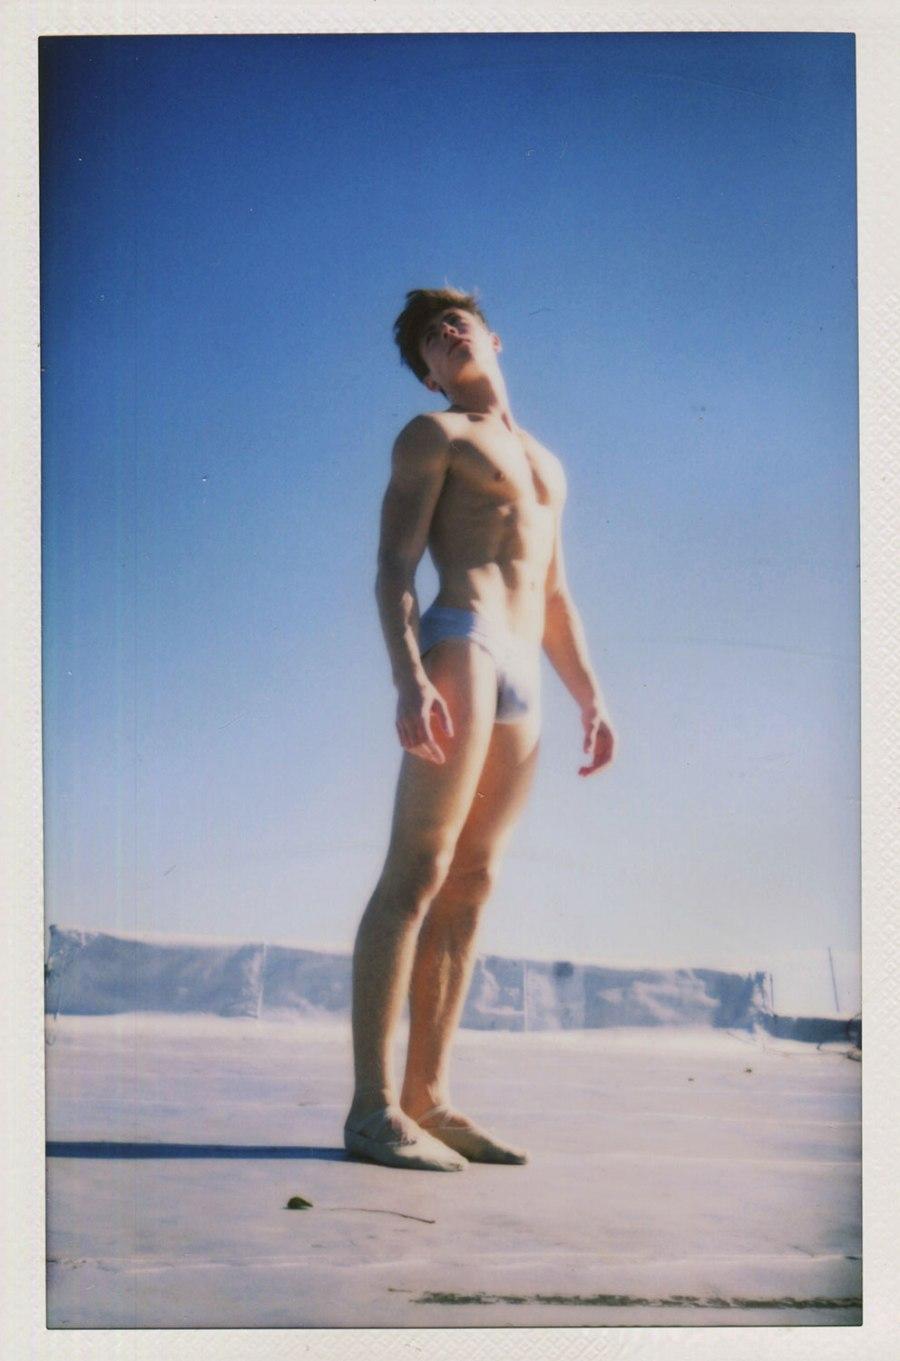 Rhys Kosakowskiby Hadar Photography (3)